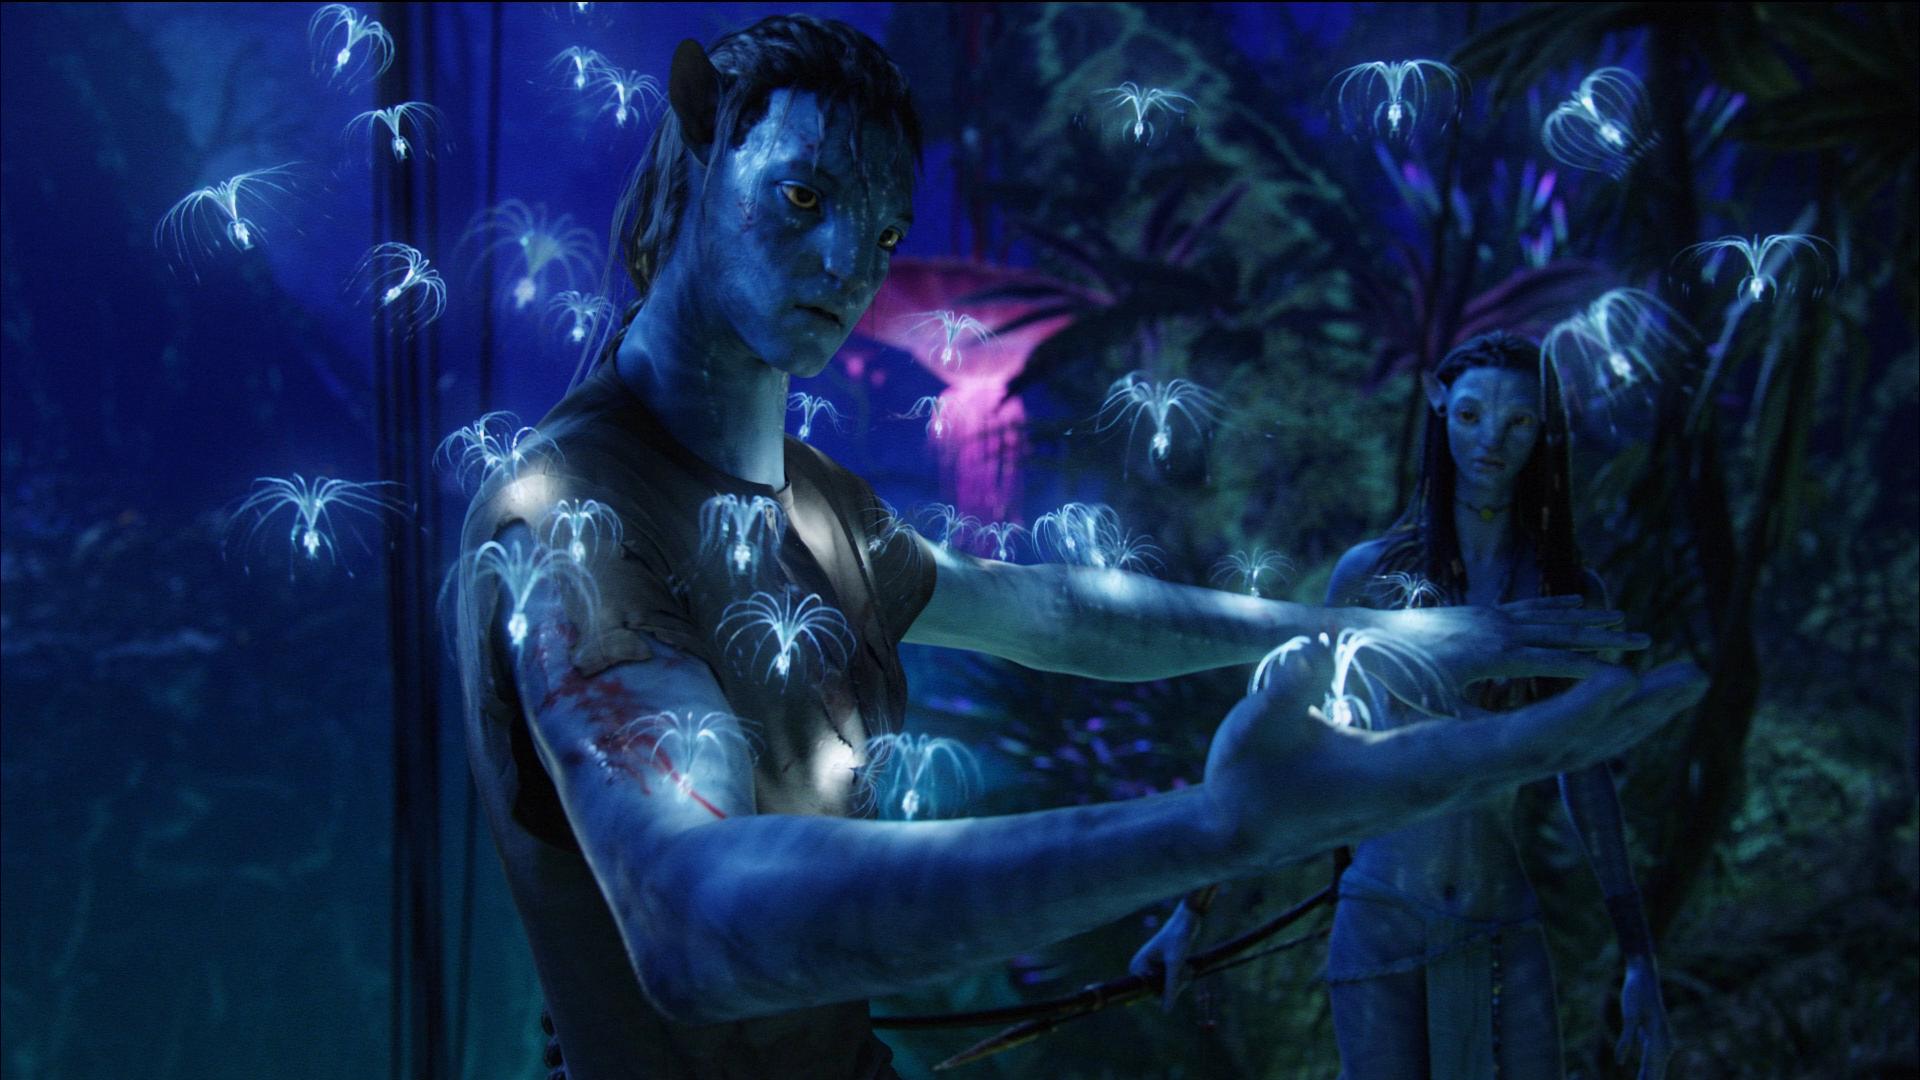 James Cameron Has Enough Scripts For Four Avatar Sequels - Overmental: overmental.com/content/james-cameron-has-enough-scripts-for-four...